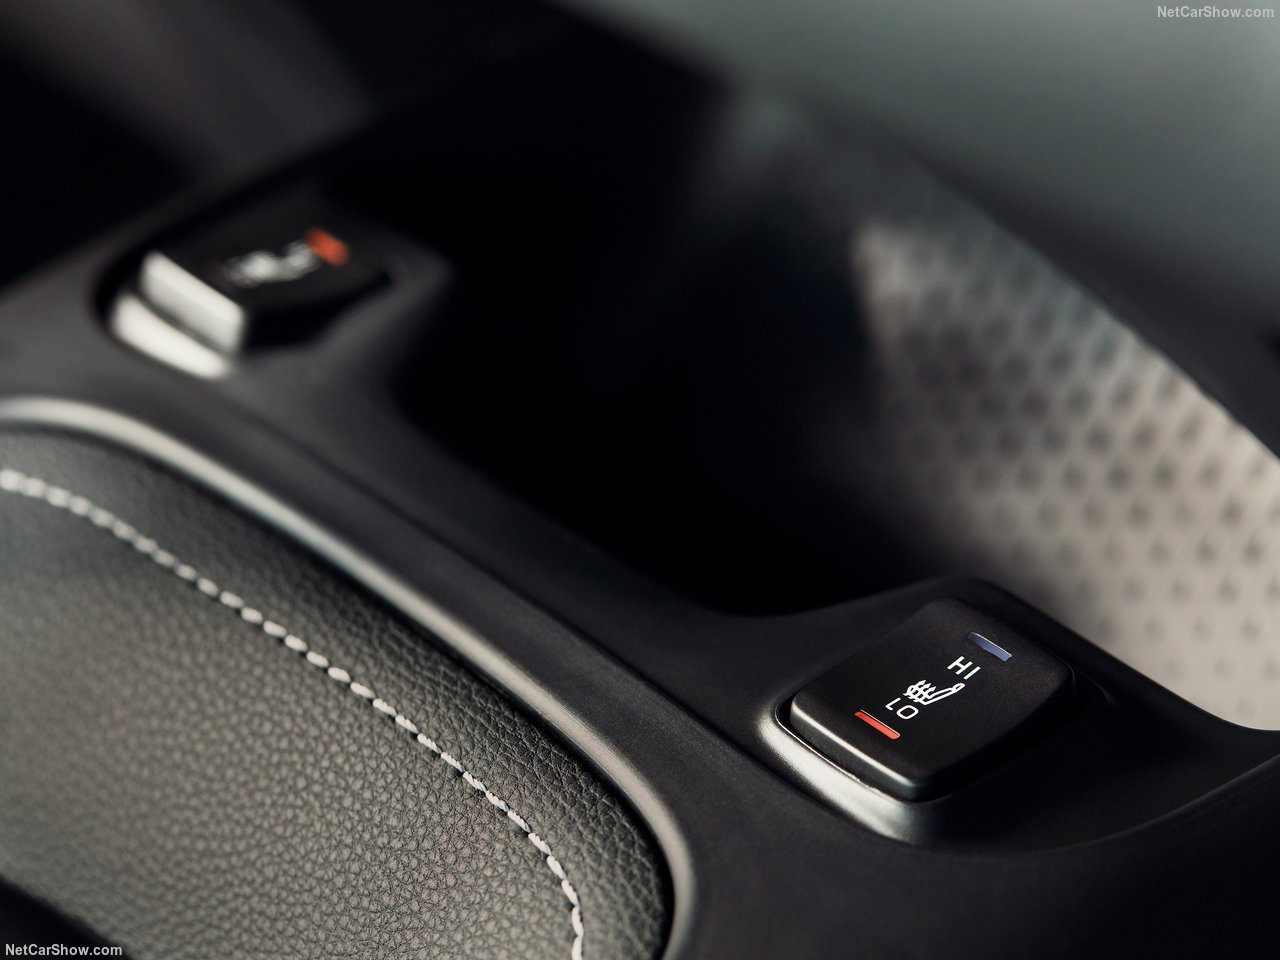 Toyota-Corolla_Hatchback-2019-1280-50_201805300849463d7.jpg